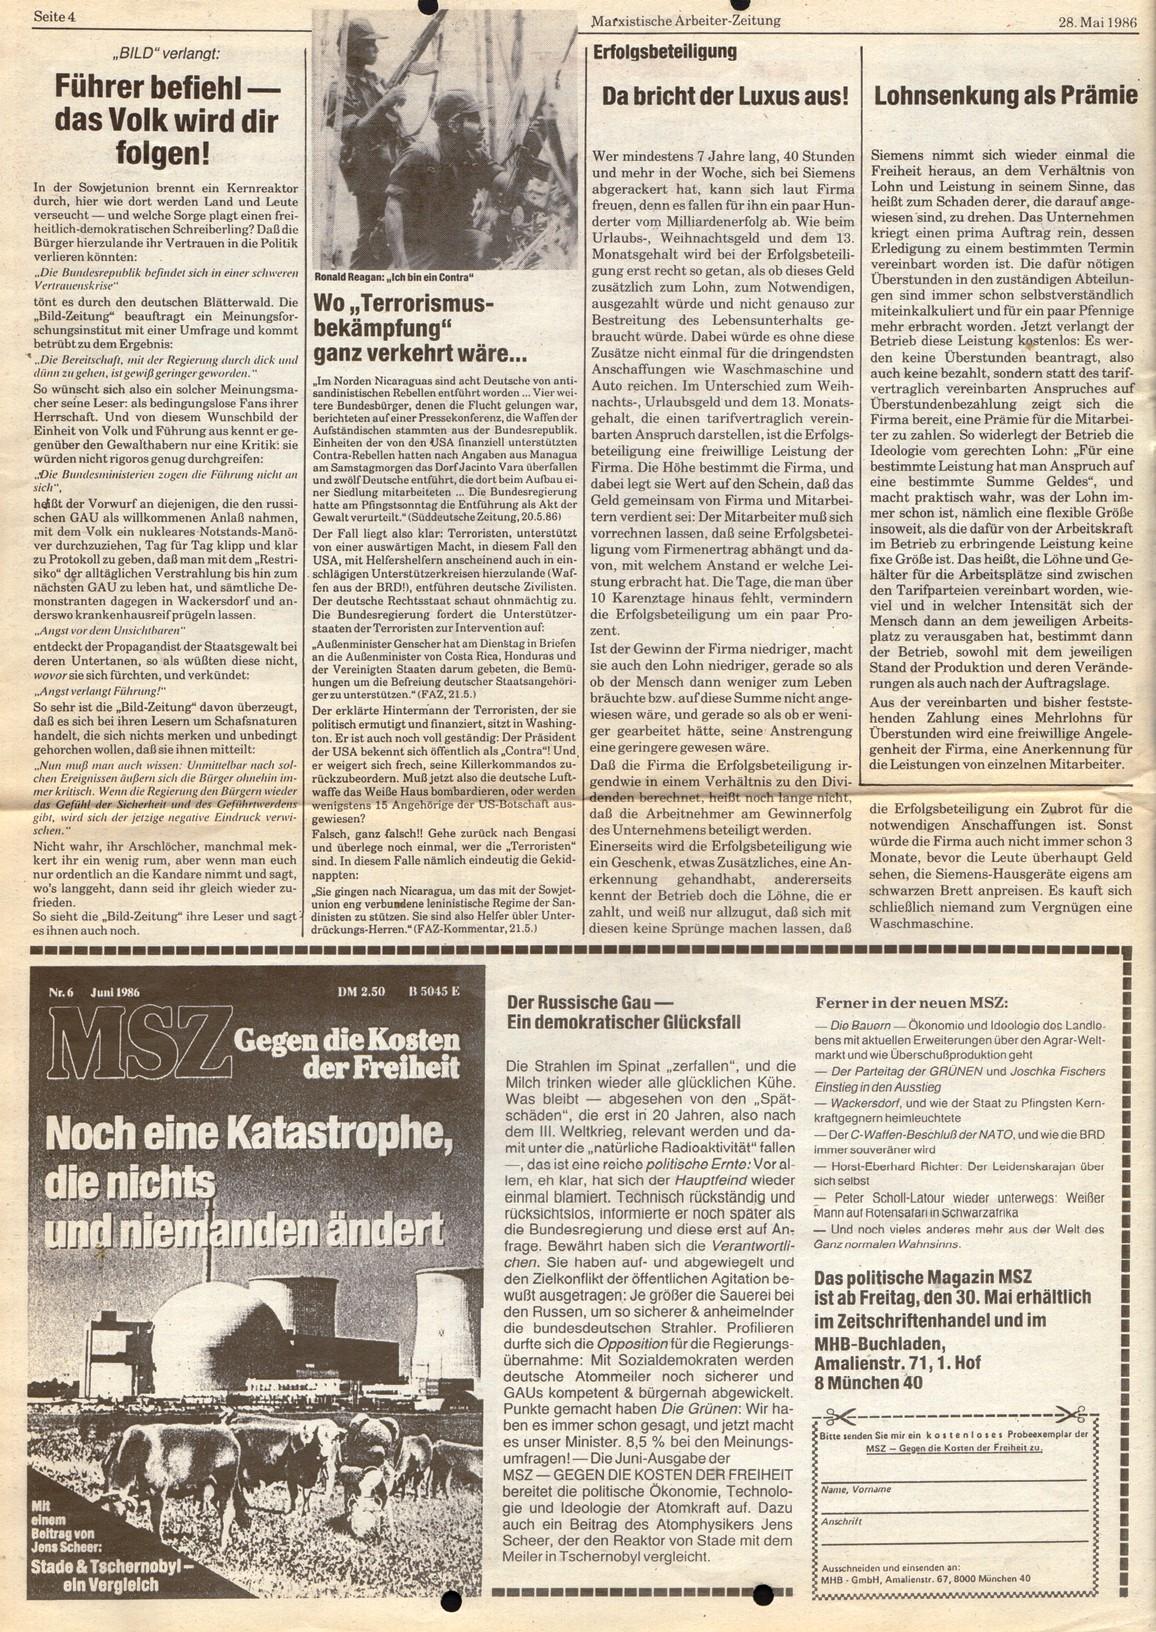 Muenchen_MG_MAZ_Siemens_19860528_04